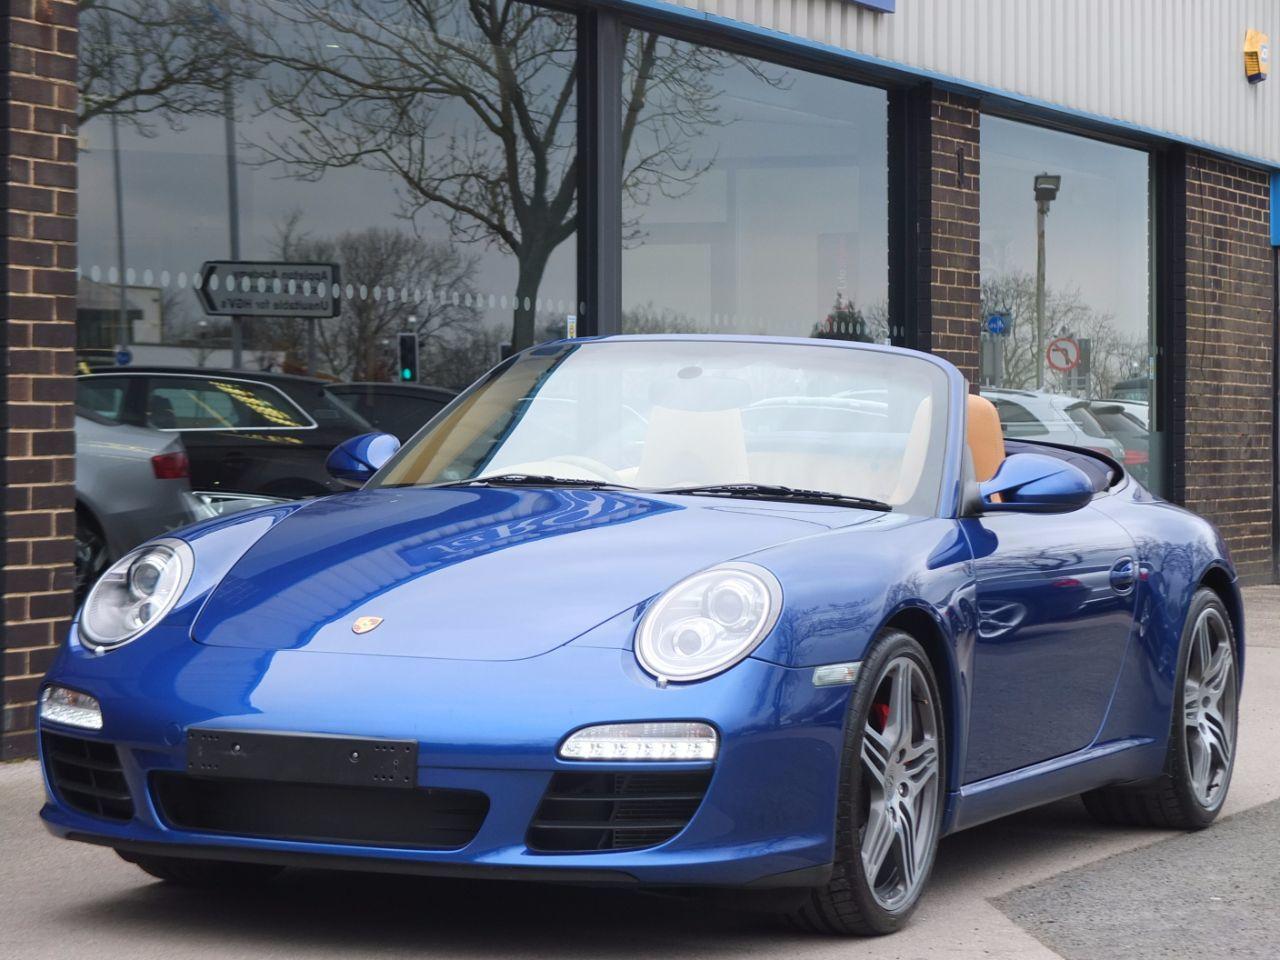 Porsche 911 Carrera 3.8 S Cabriolet (997 Gen II) Convertible Petrol Aqua  Blue MetallicPorsche